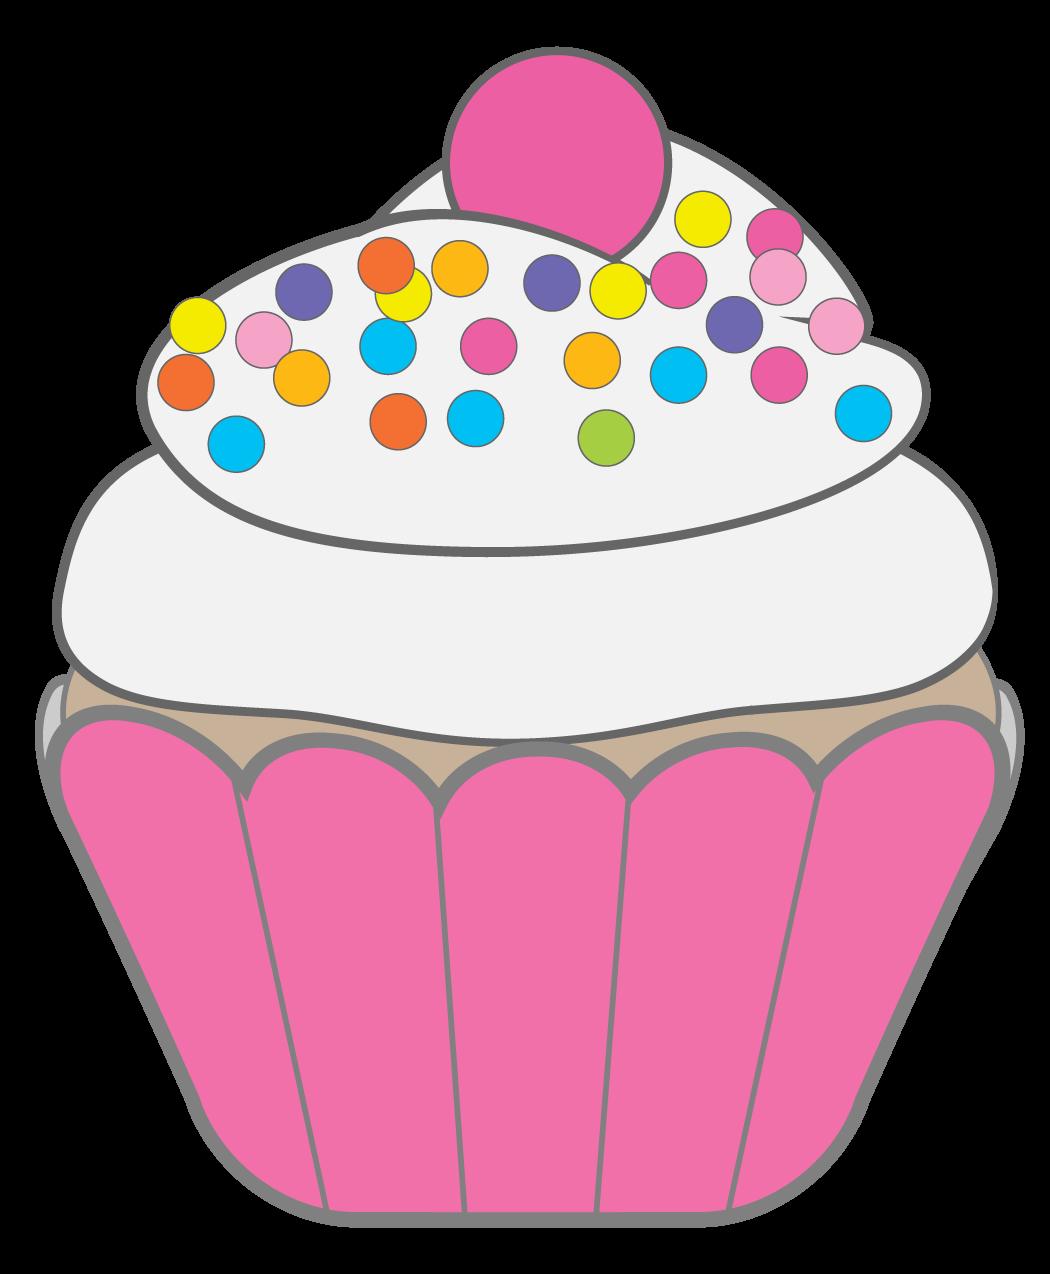 Cake clipart january #8